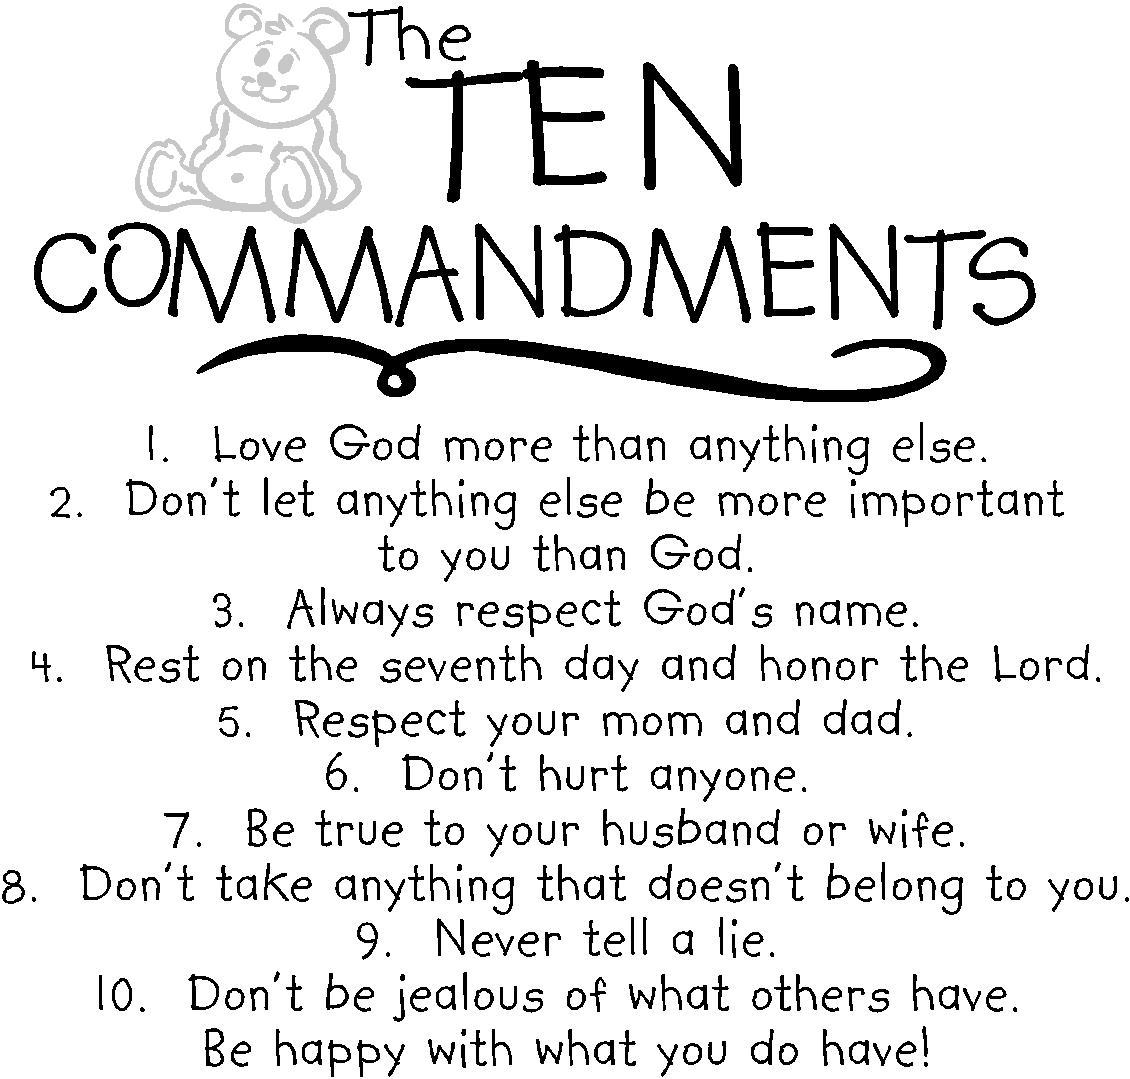 10 commandments coloring pages catholic photo - 1